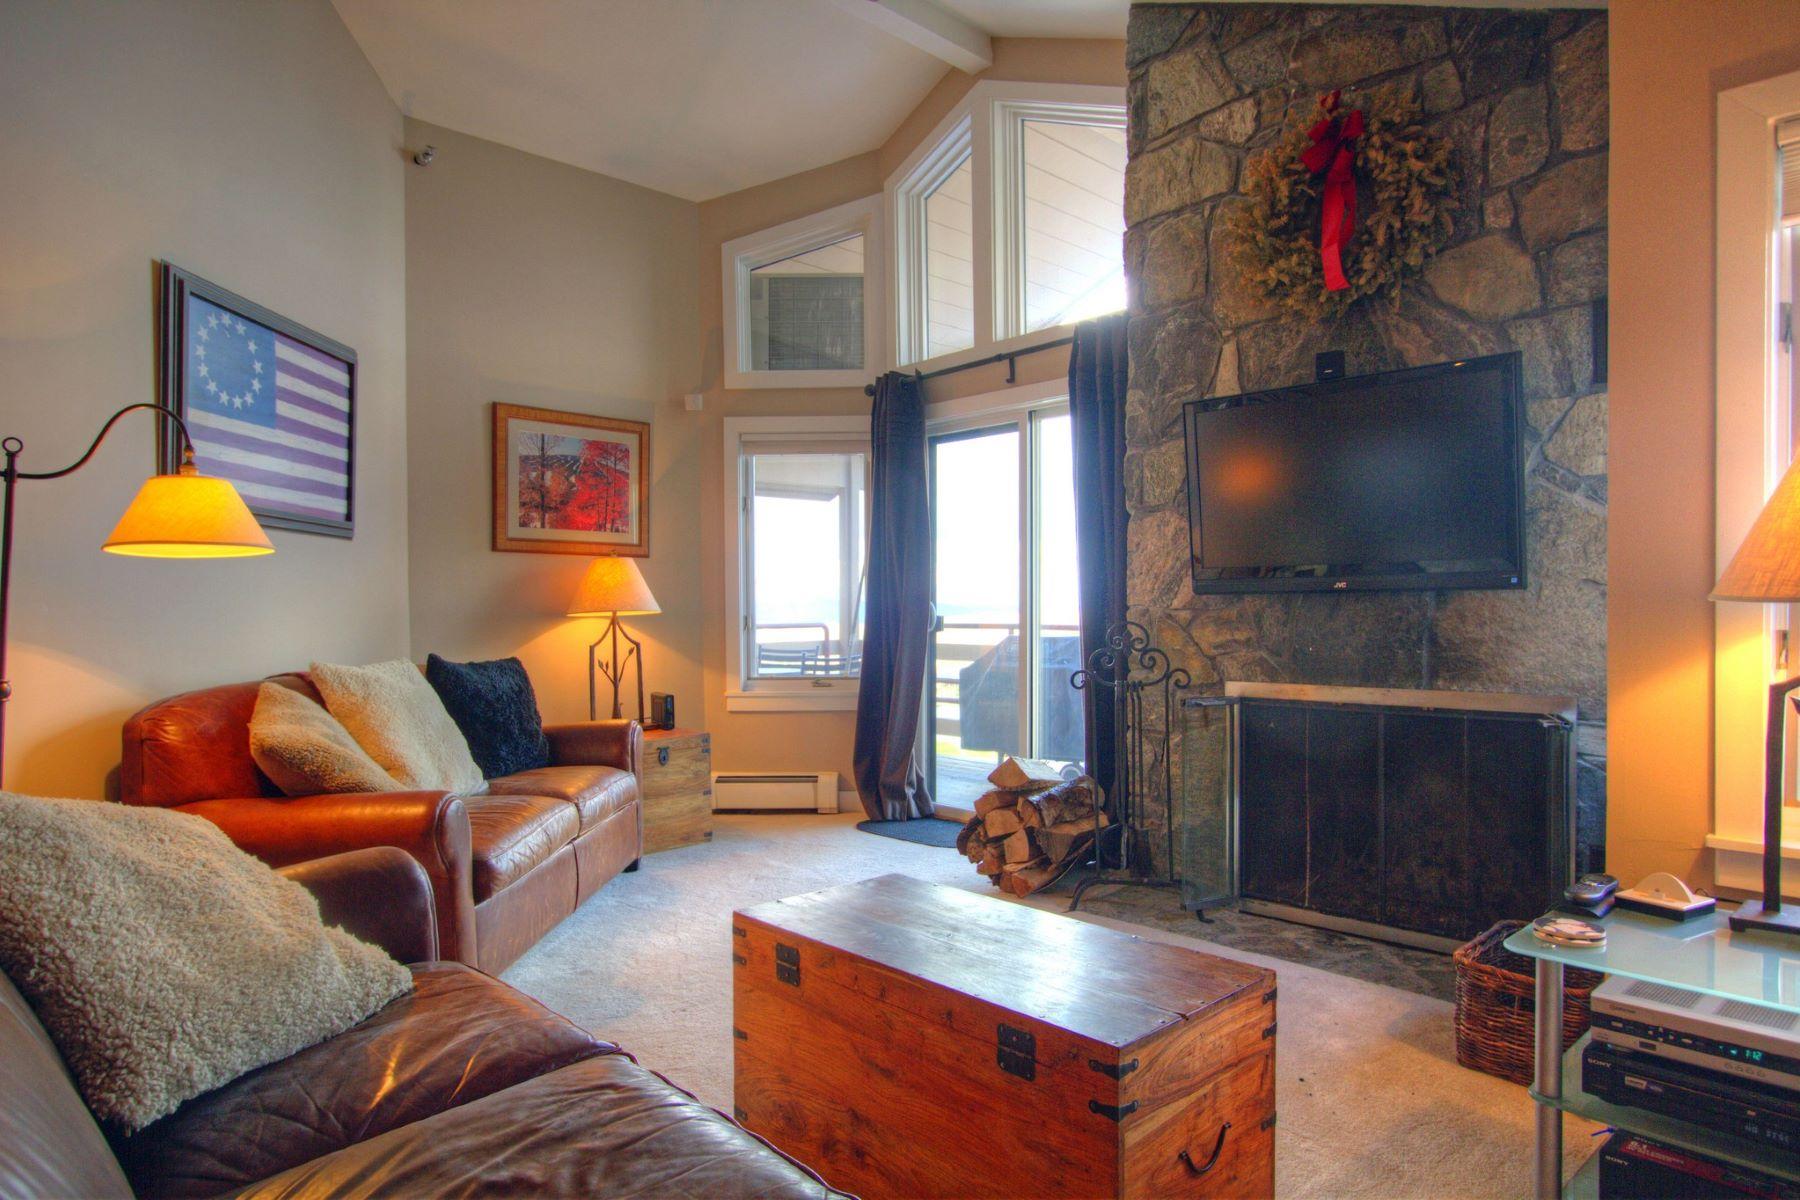 Condominio por un Venta en Stratton Resort Ski In/Ski Out 778 Stratton Mountain Access 2303 Stratton, Vermont, 05155 Estados Unidos